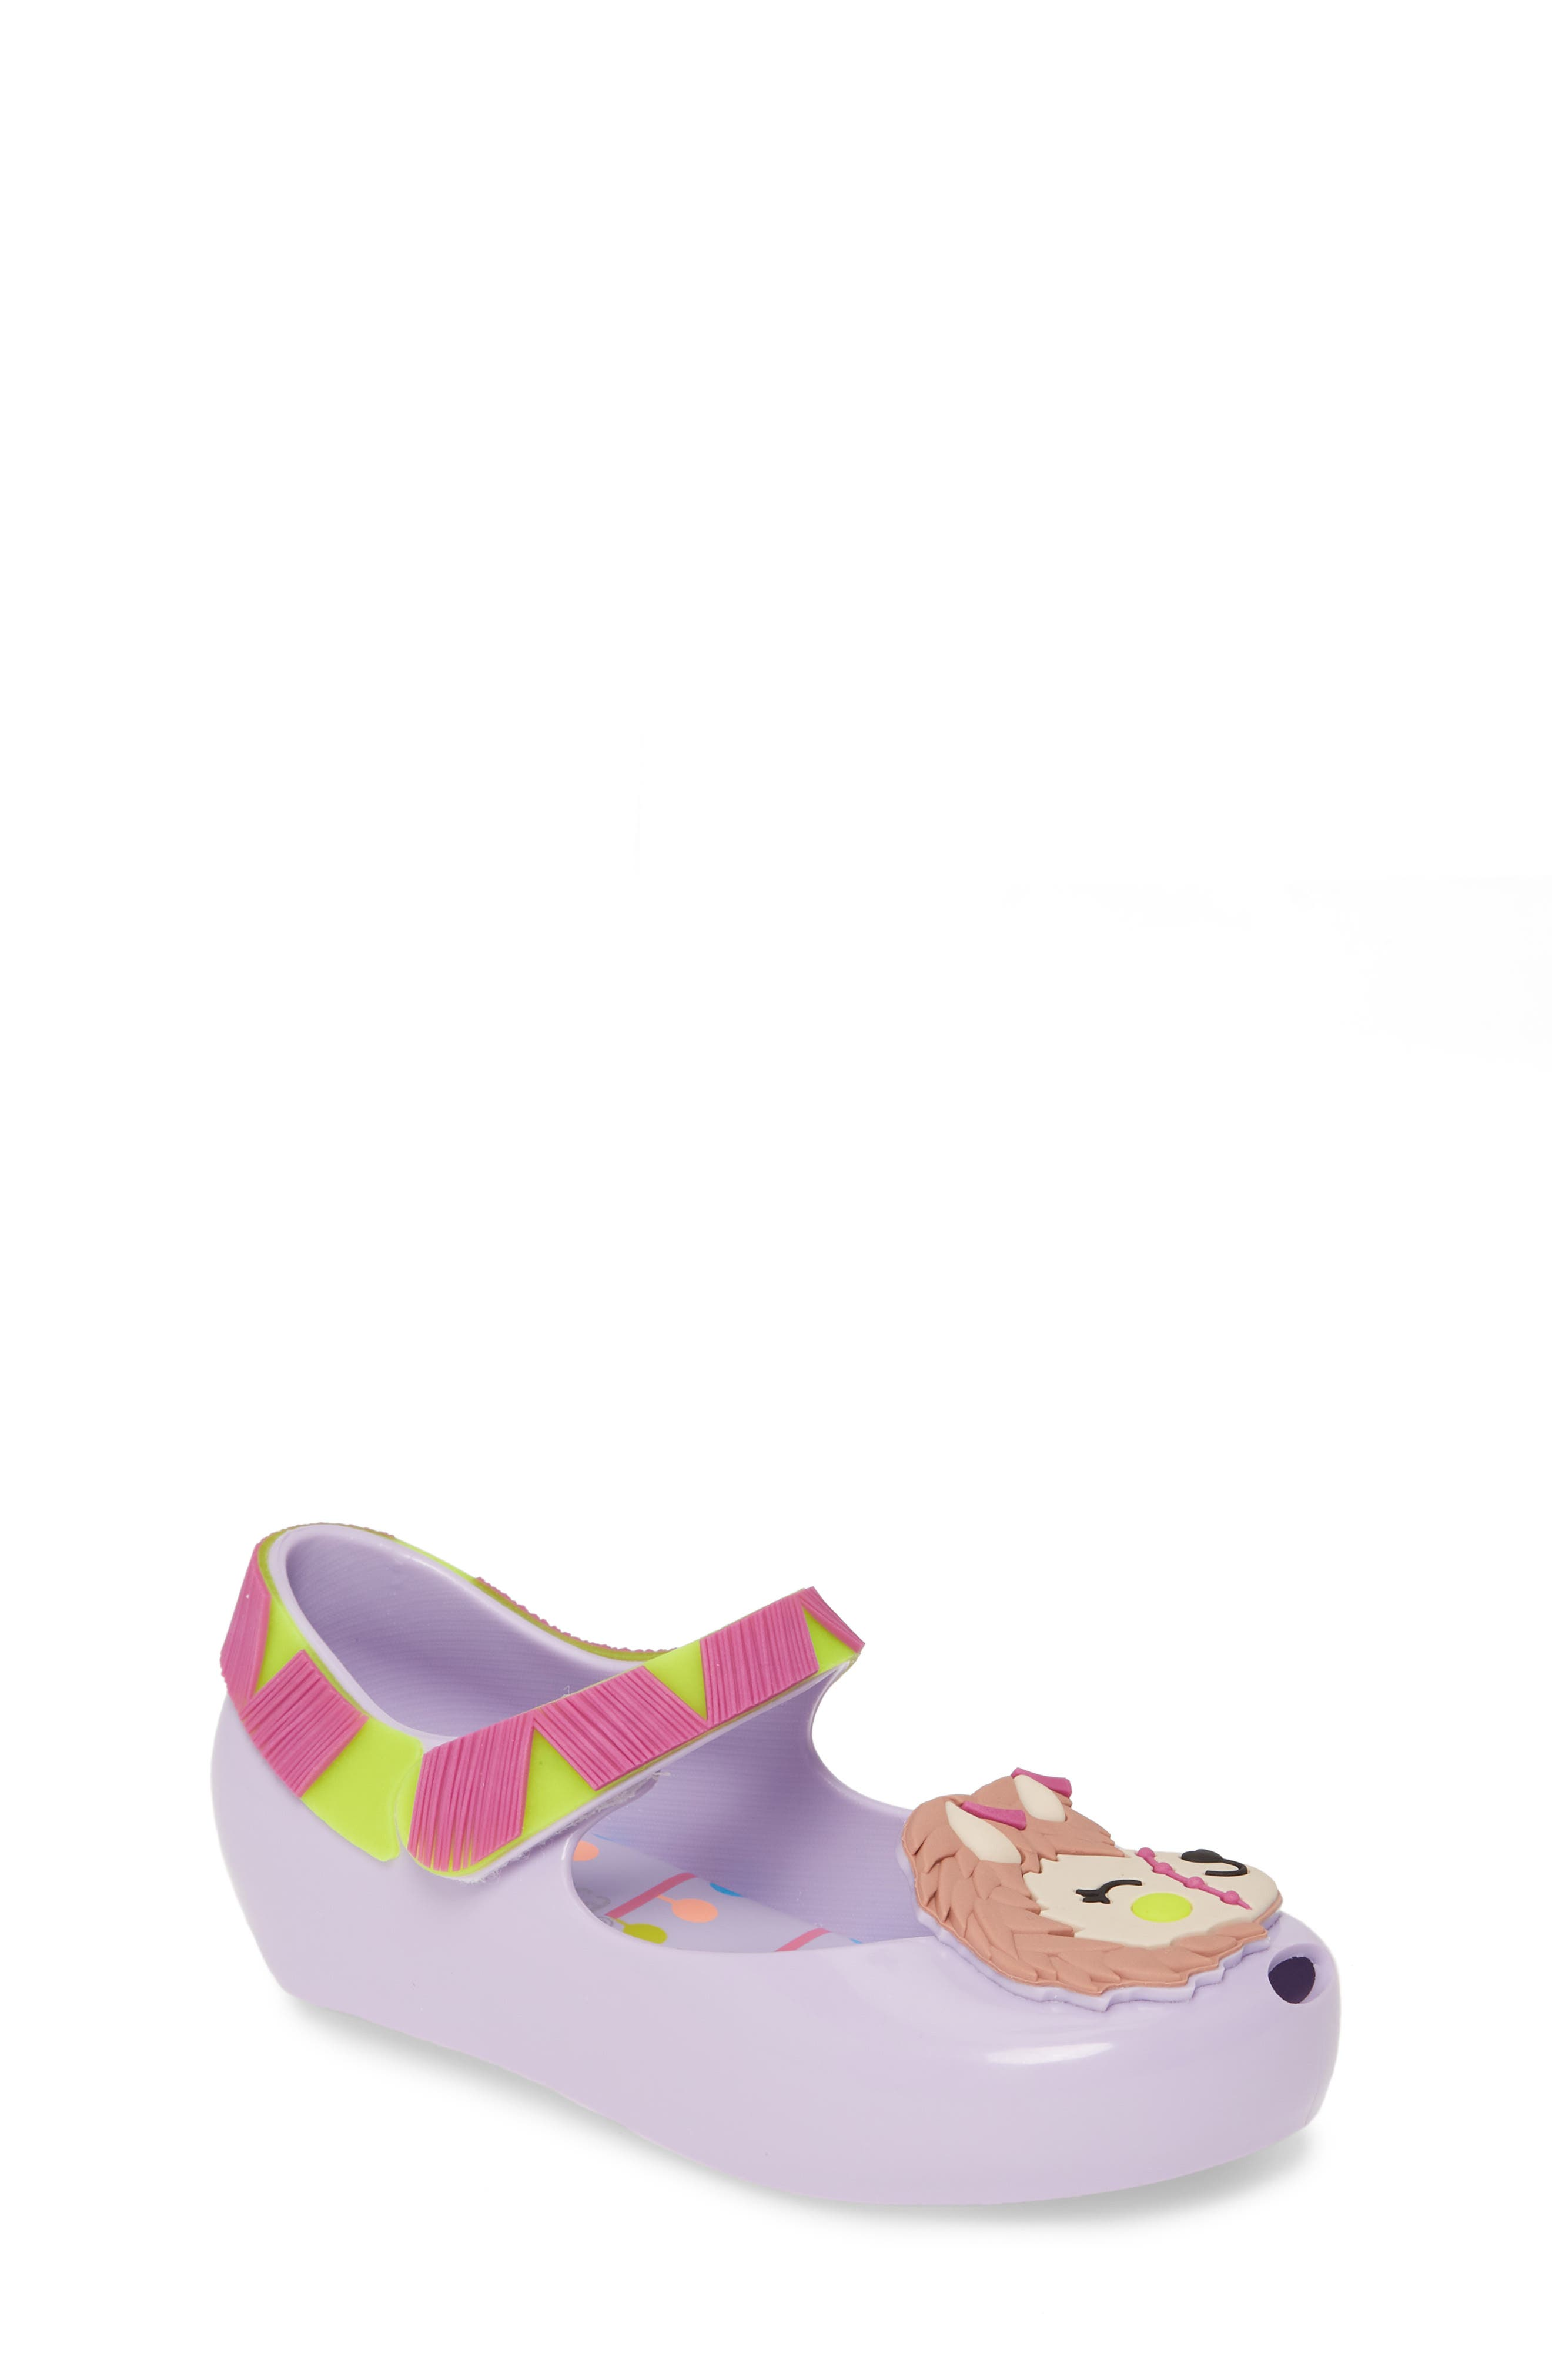 Toddler Girls Melissa Ultra 14 Flat Size 7 M  Purple